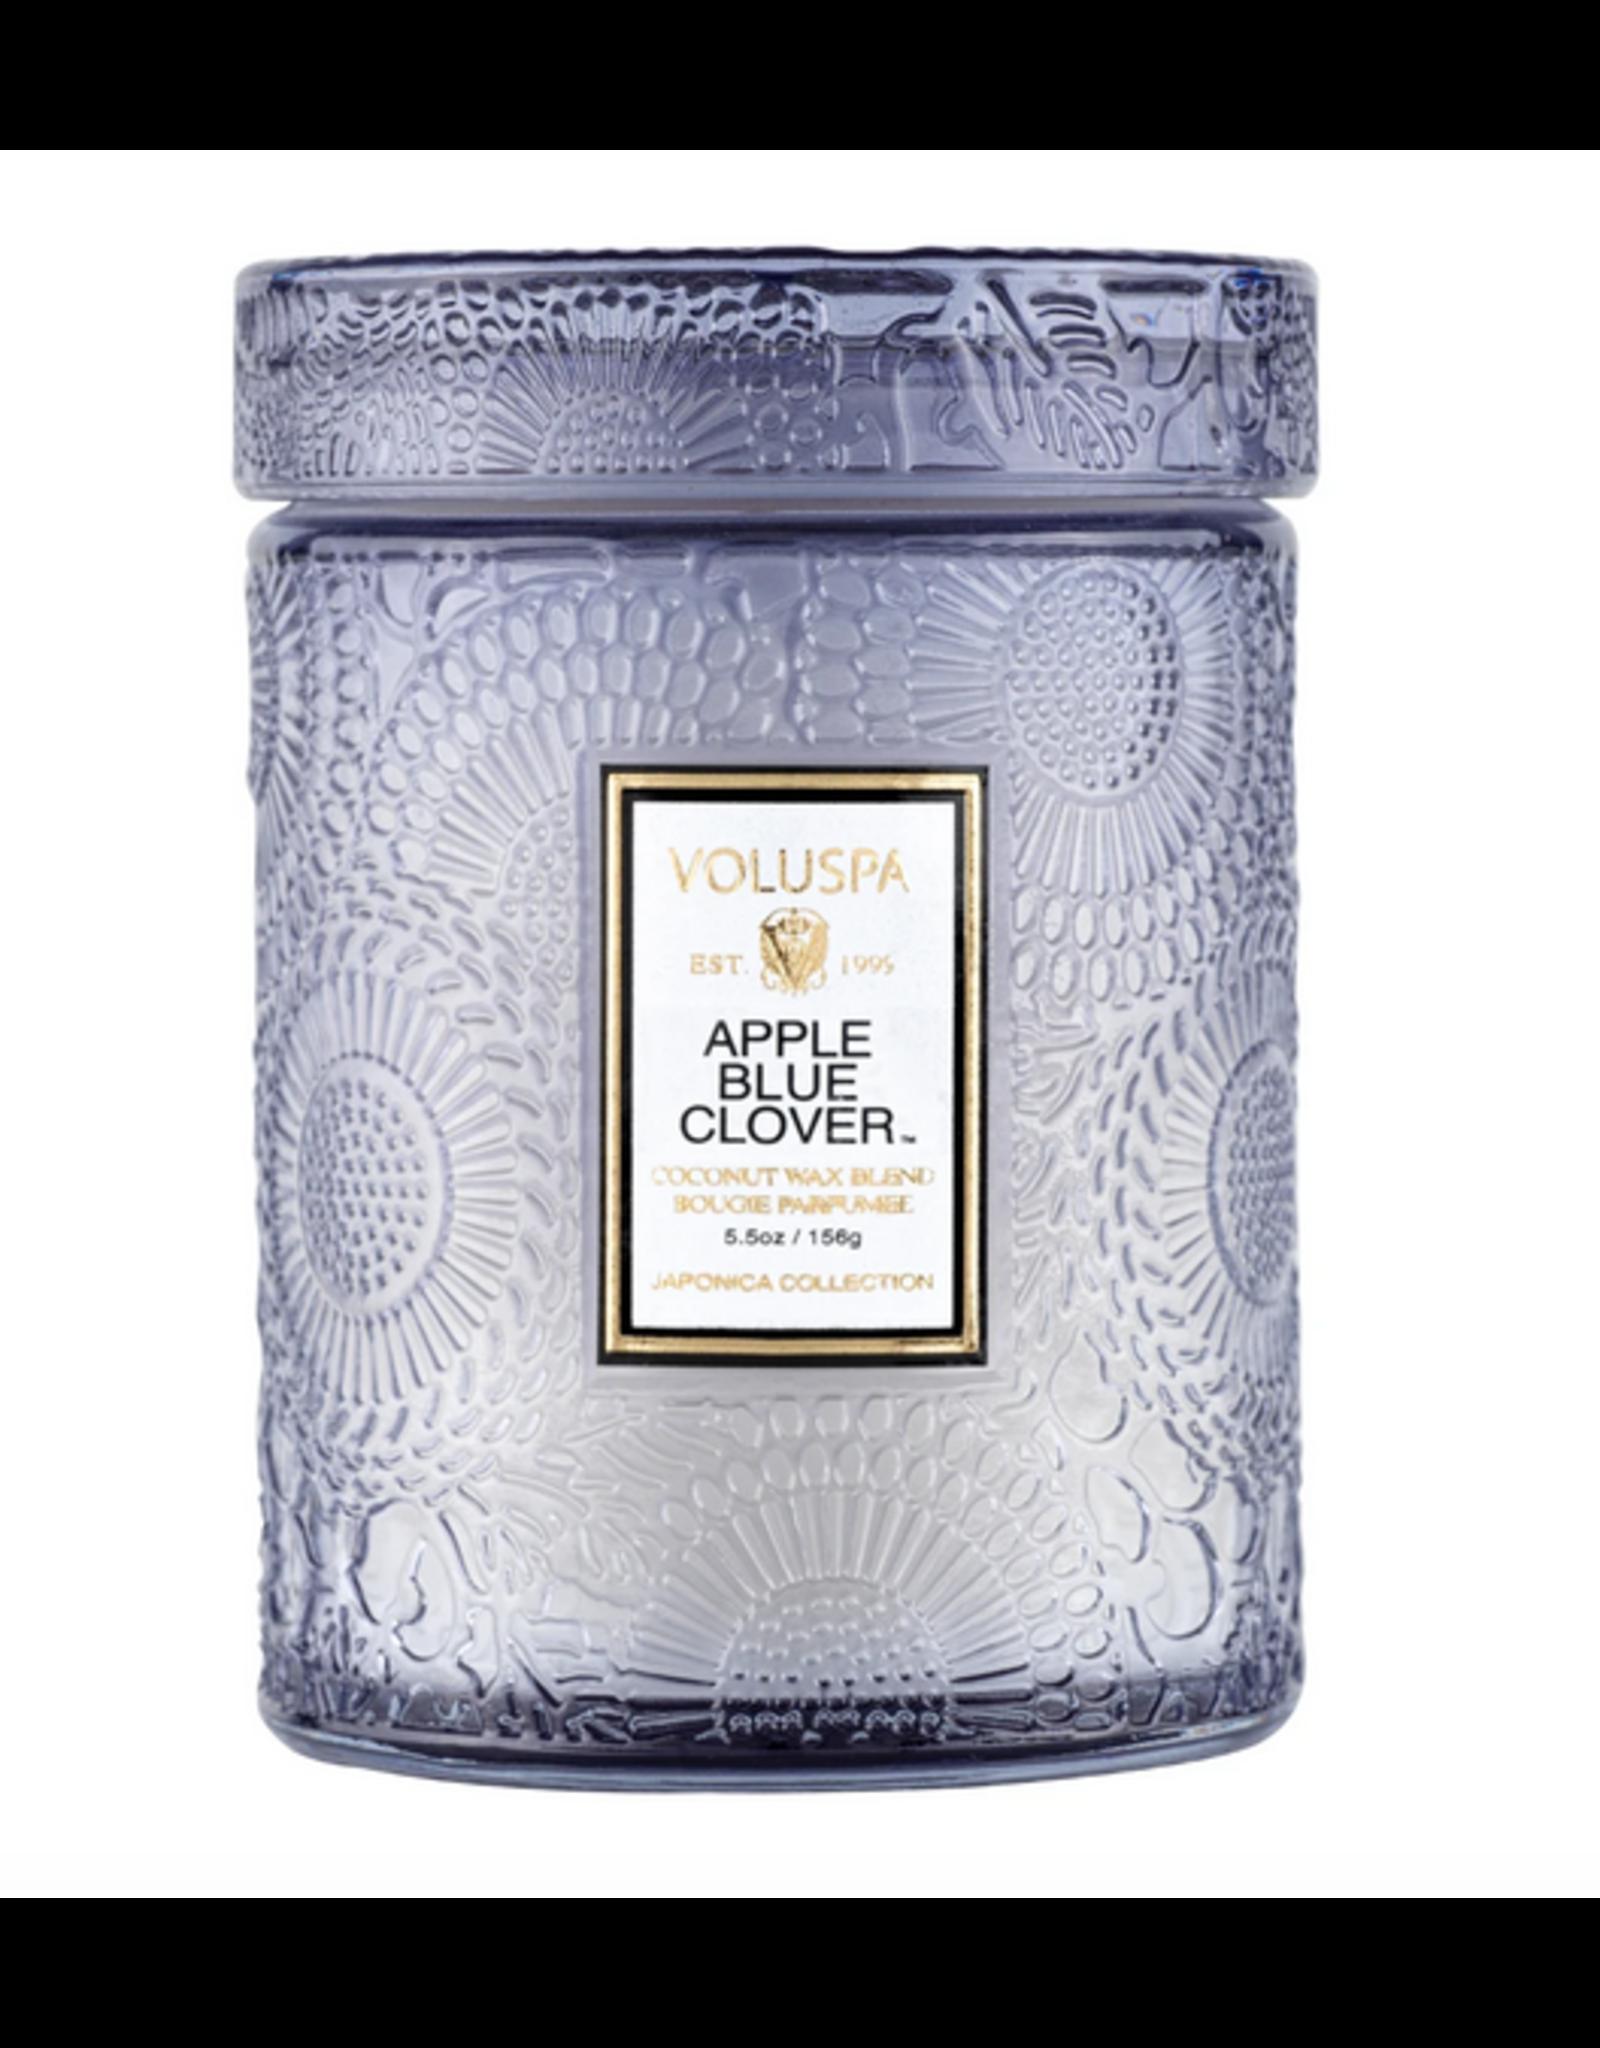 Voluspa Apple Blue Clover Small Jar Glass Candle